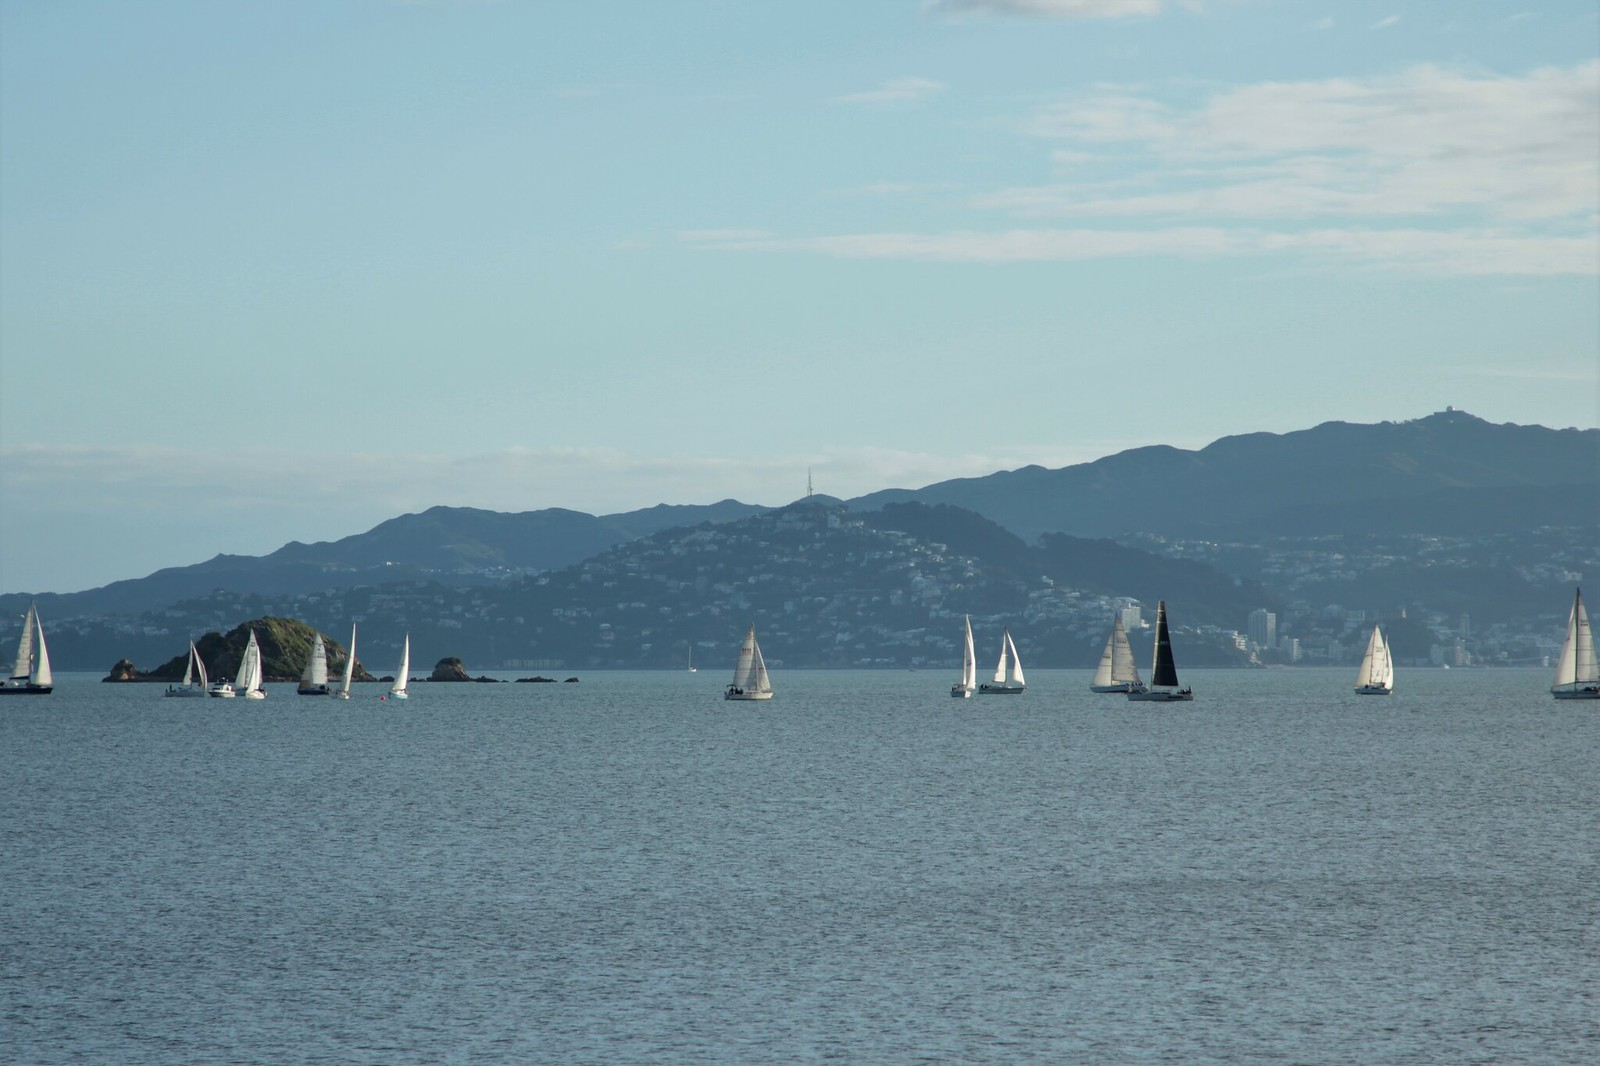 IMG_2258 (Flotilla)